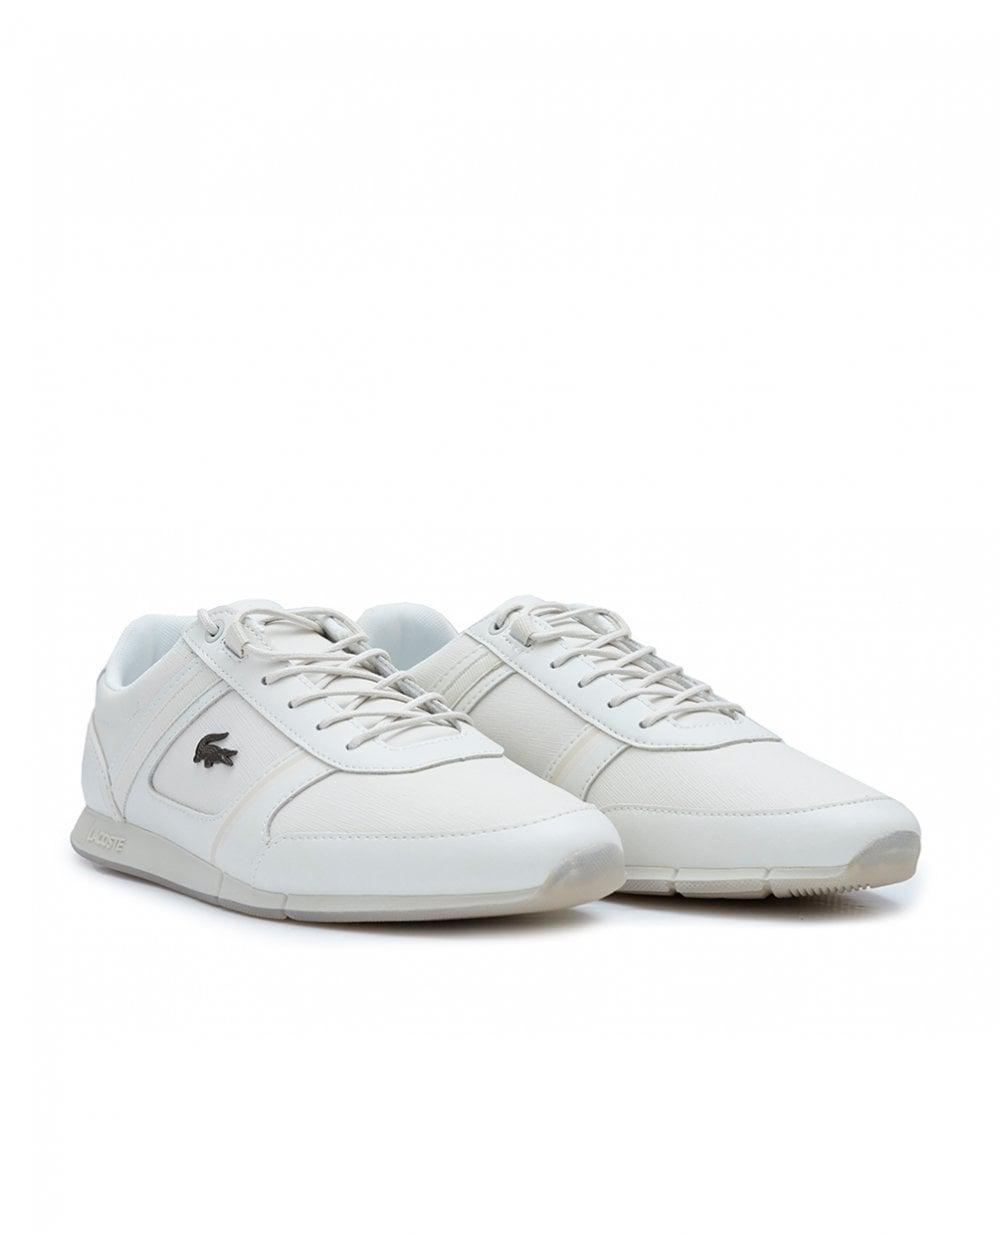 fe9c473338ab22 Lacoste Menerva Trainers in White for Men - Lyst